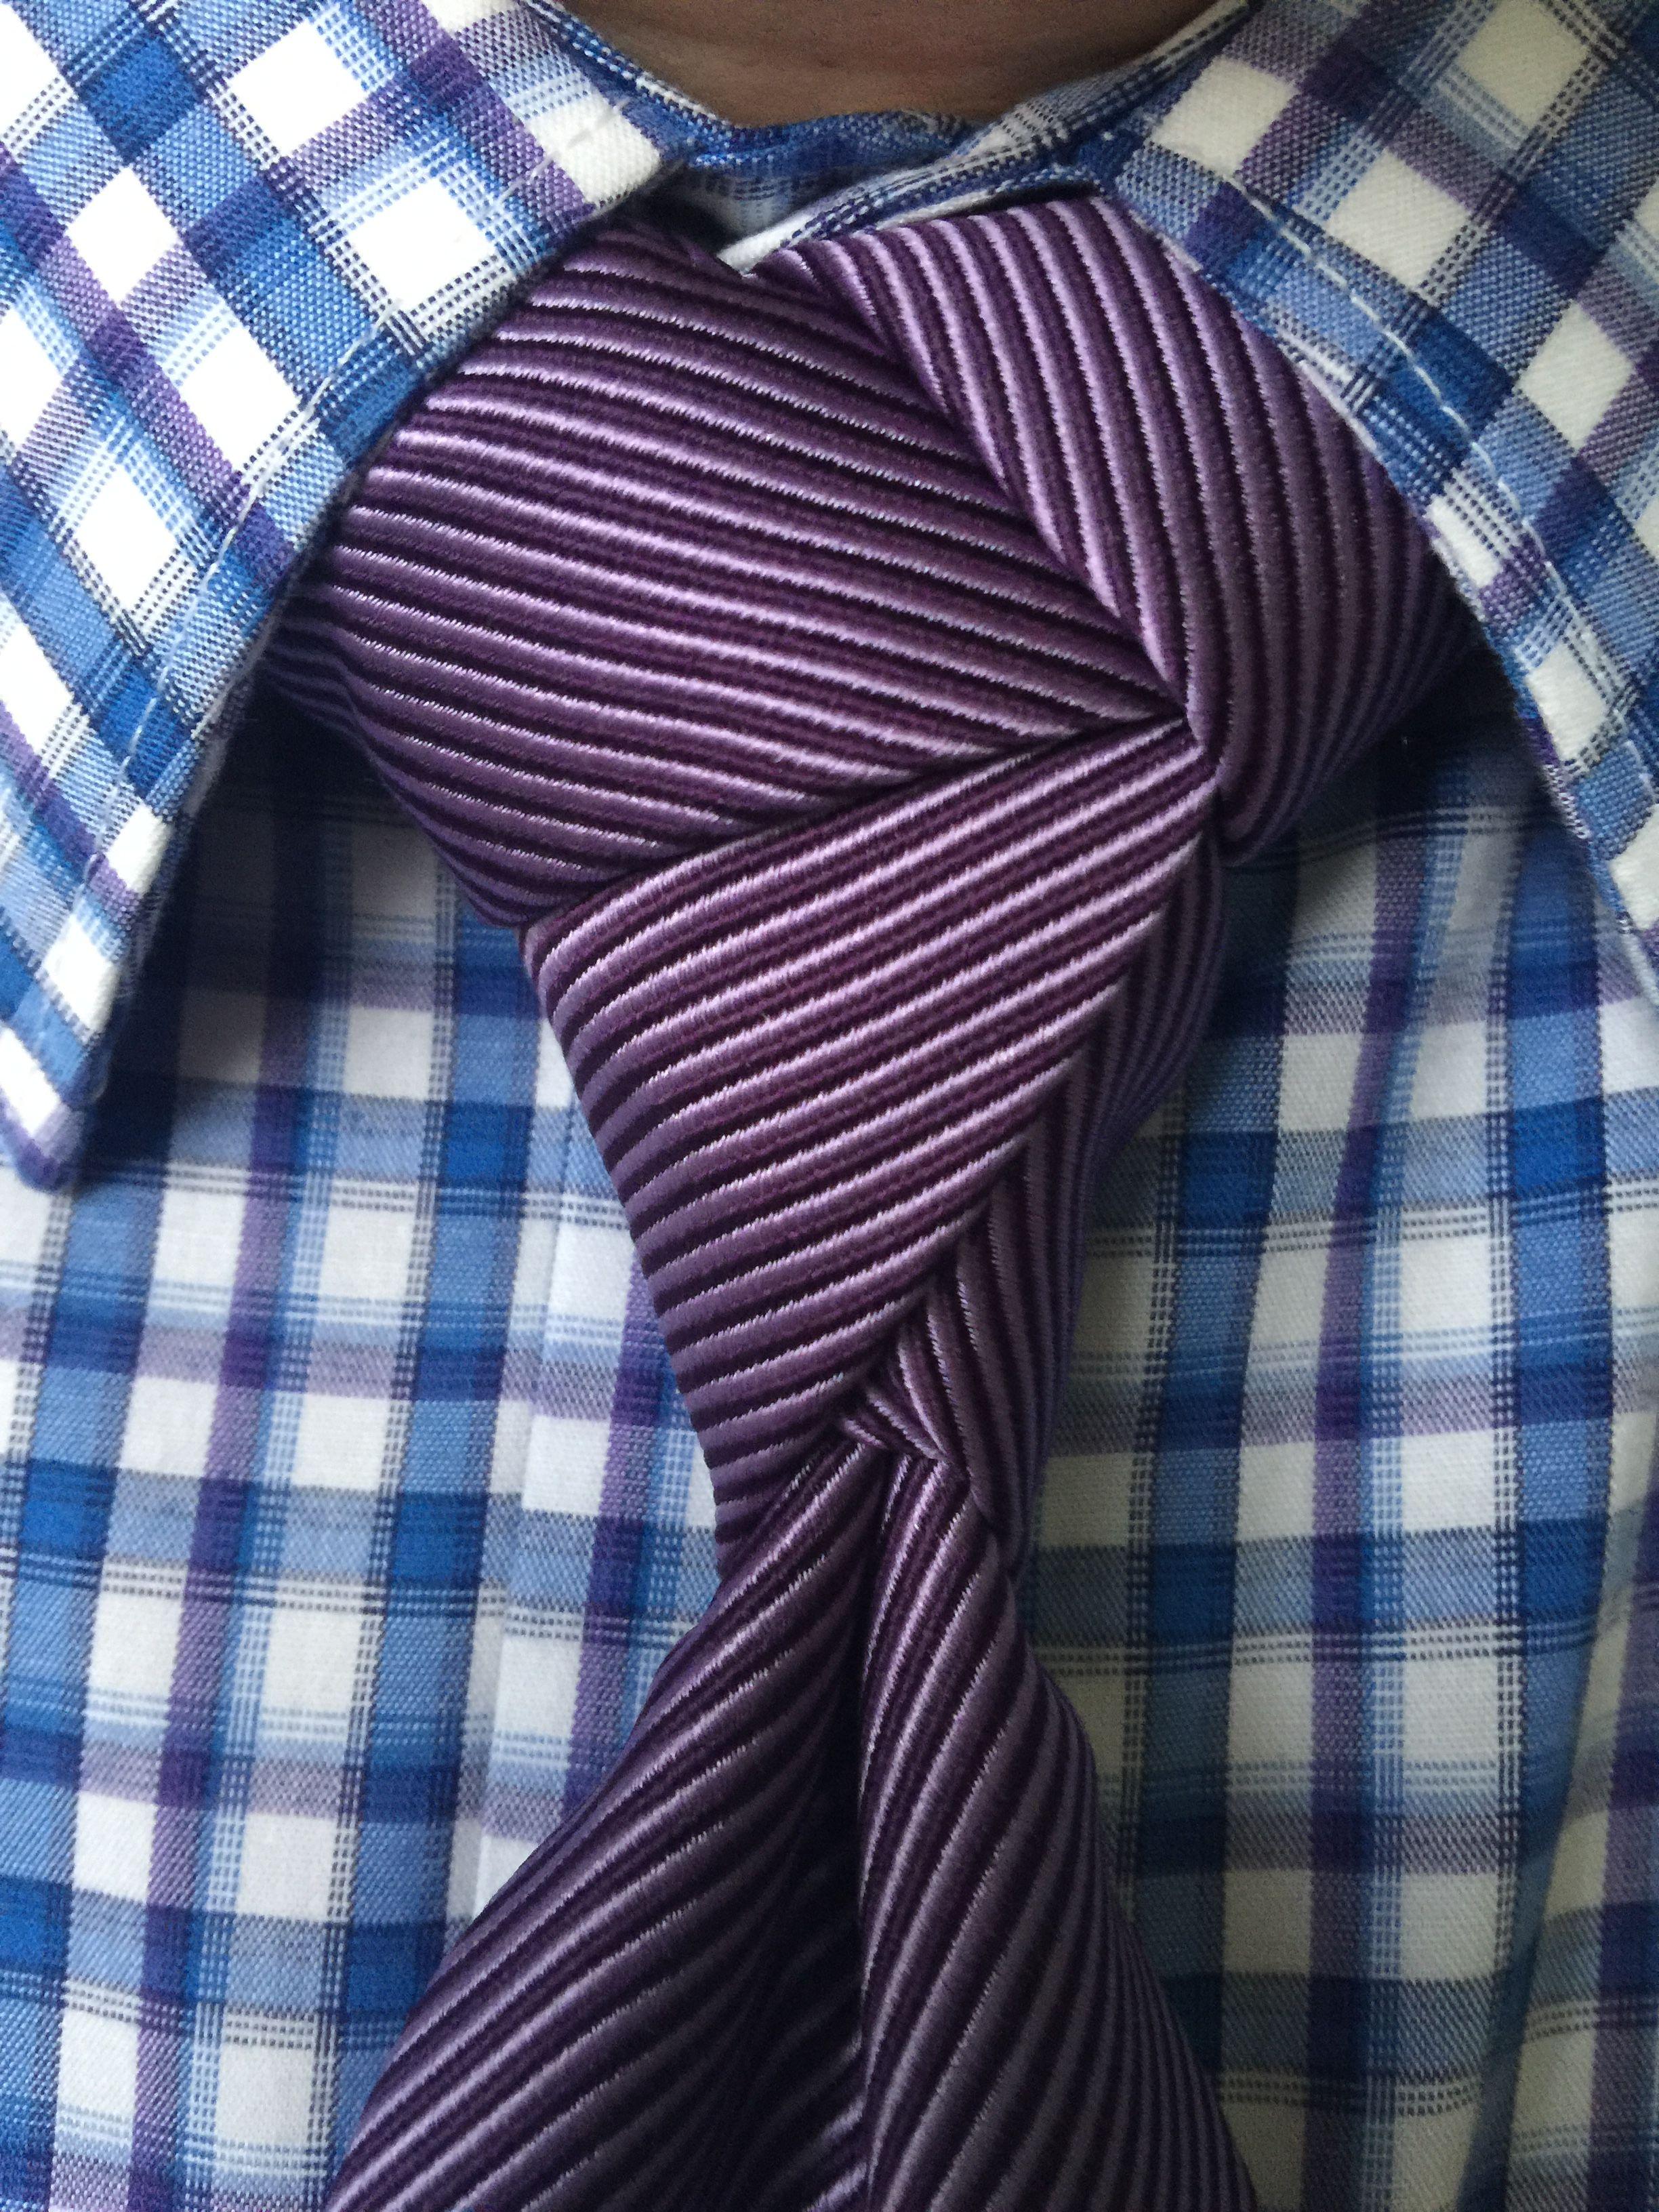 Cat Woman knot by Noel Junio Tie Knots I've worn